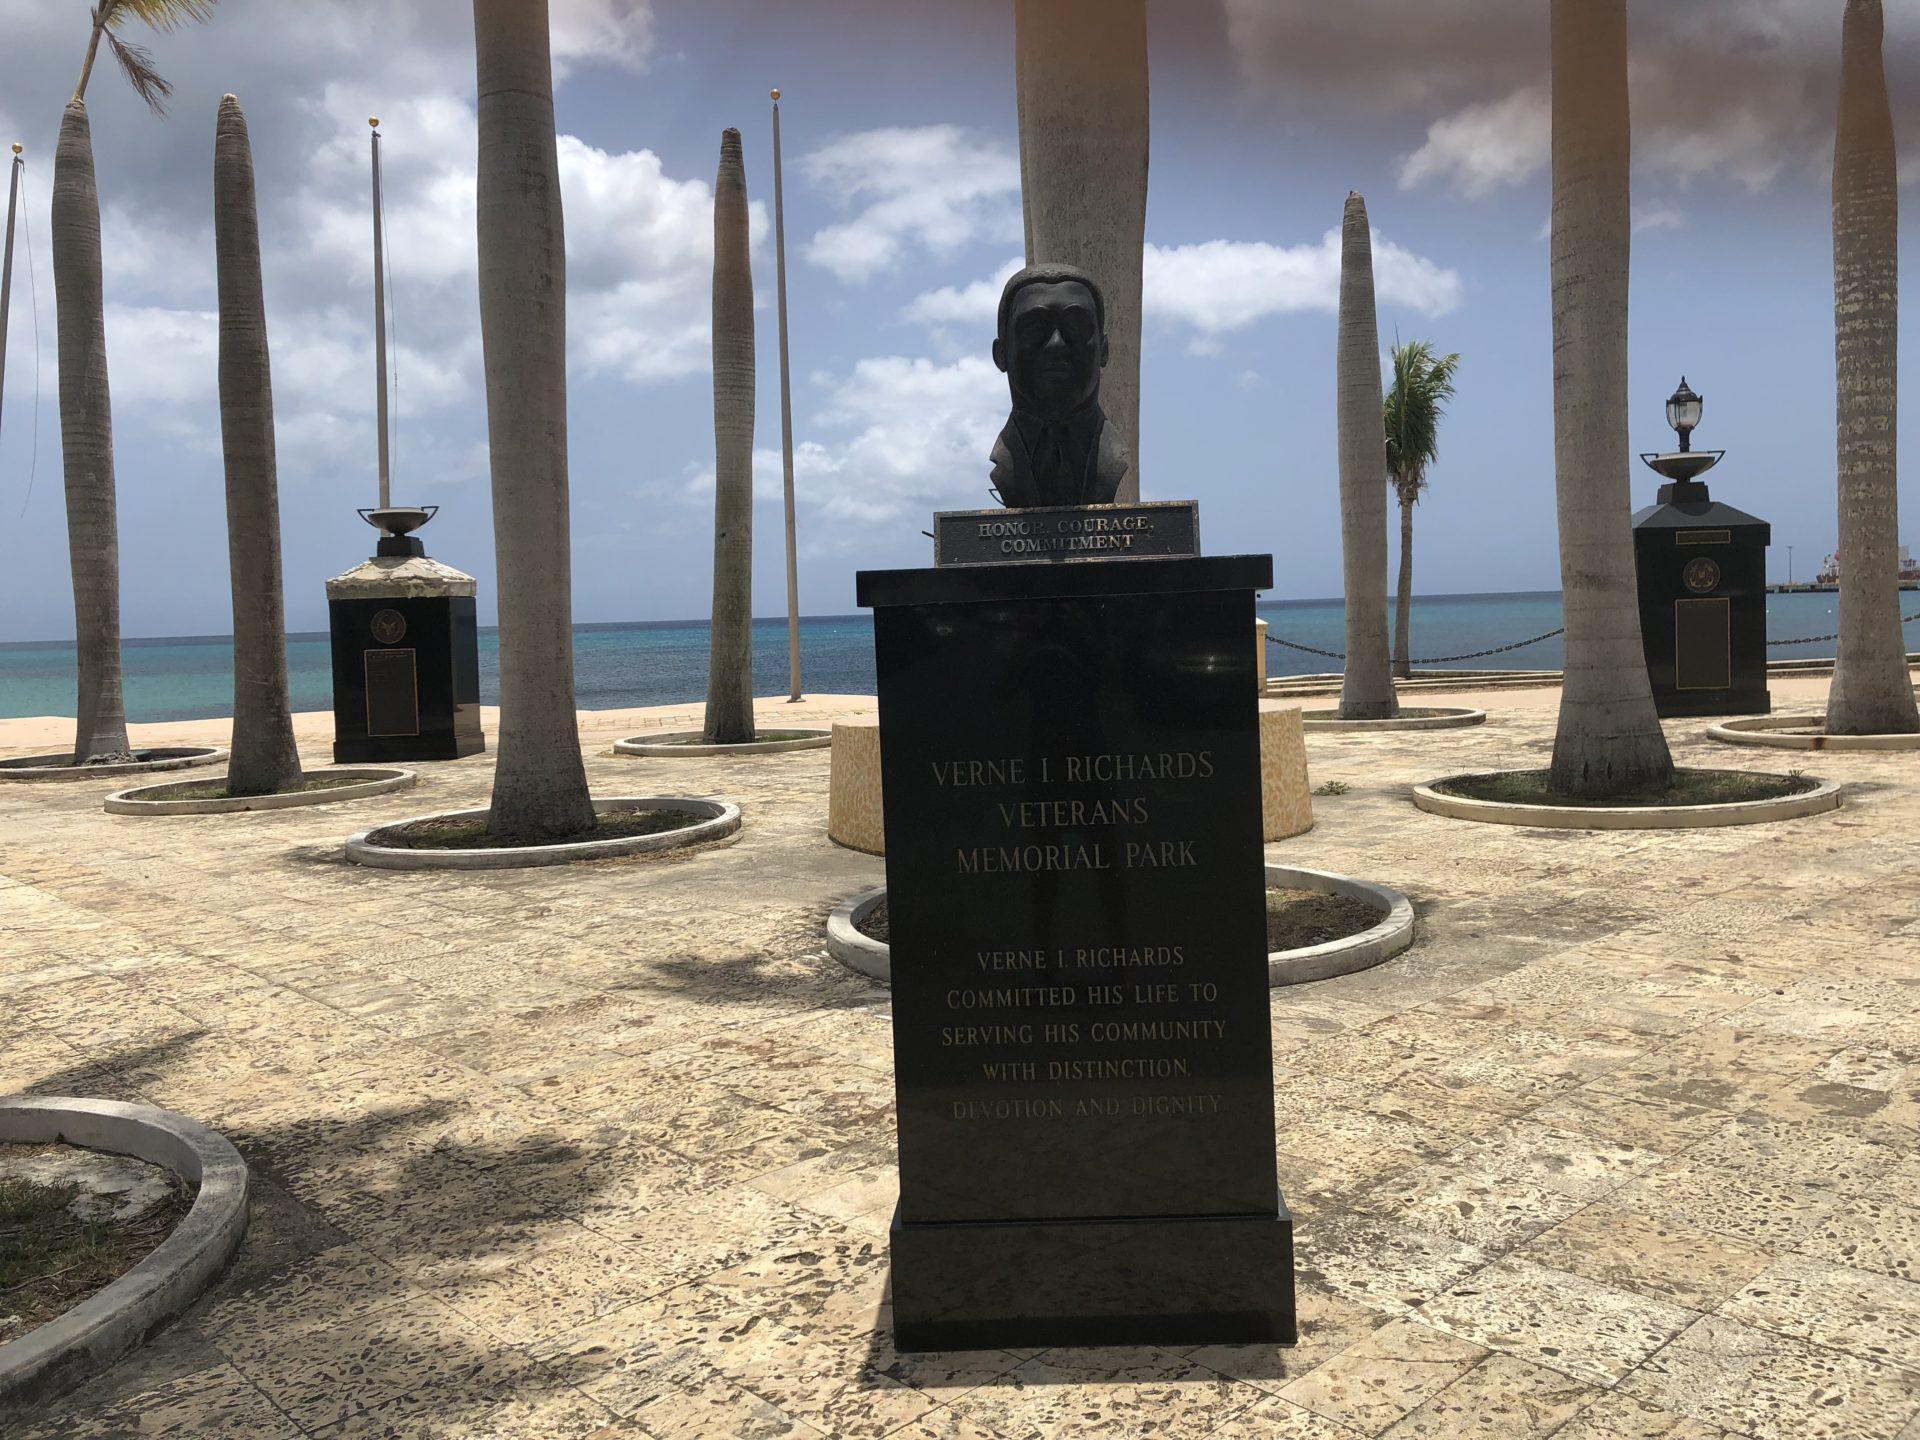 Korean War Memorials - St. Croix